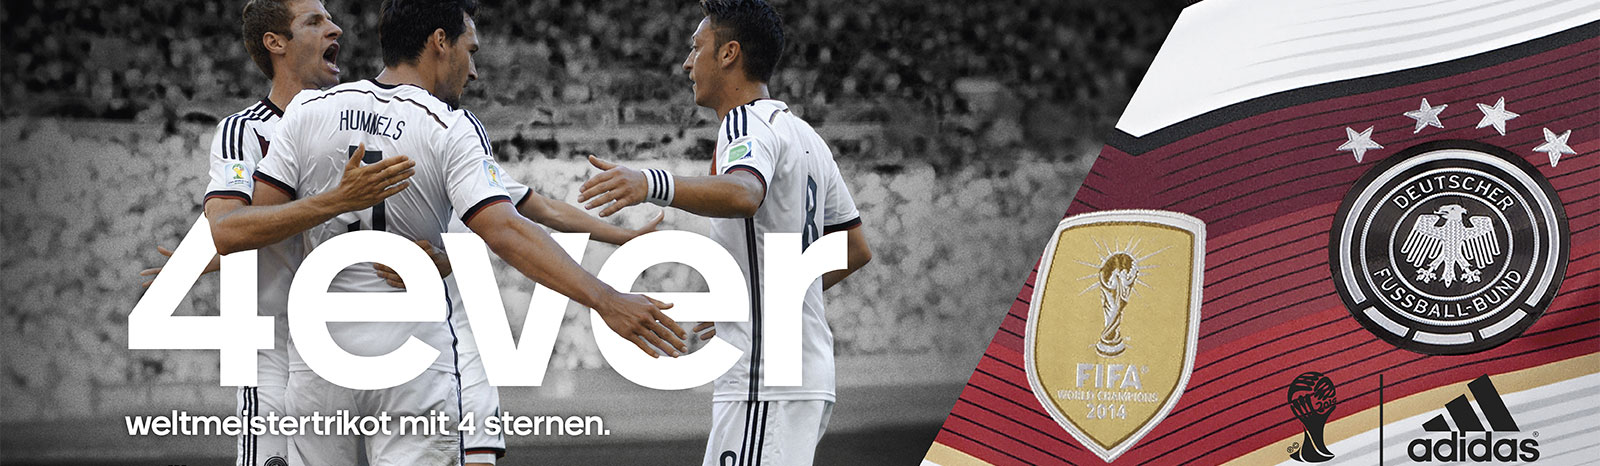 Adidas DFB 4 Sterne Fanartikel 4ever